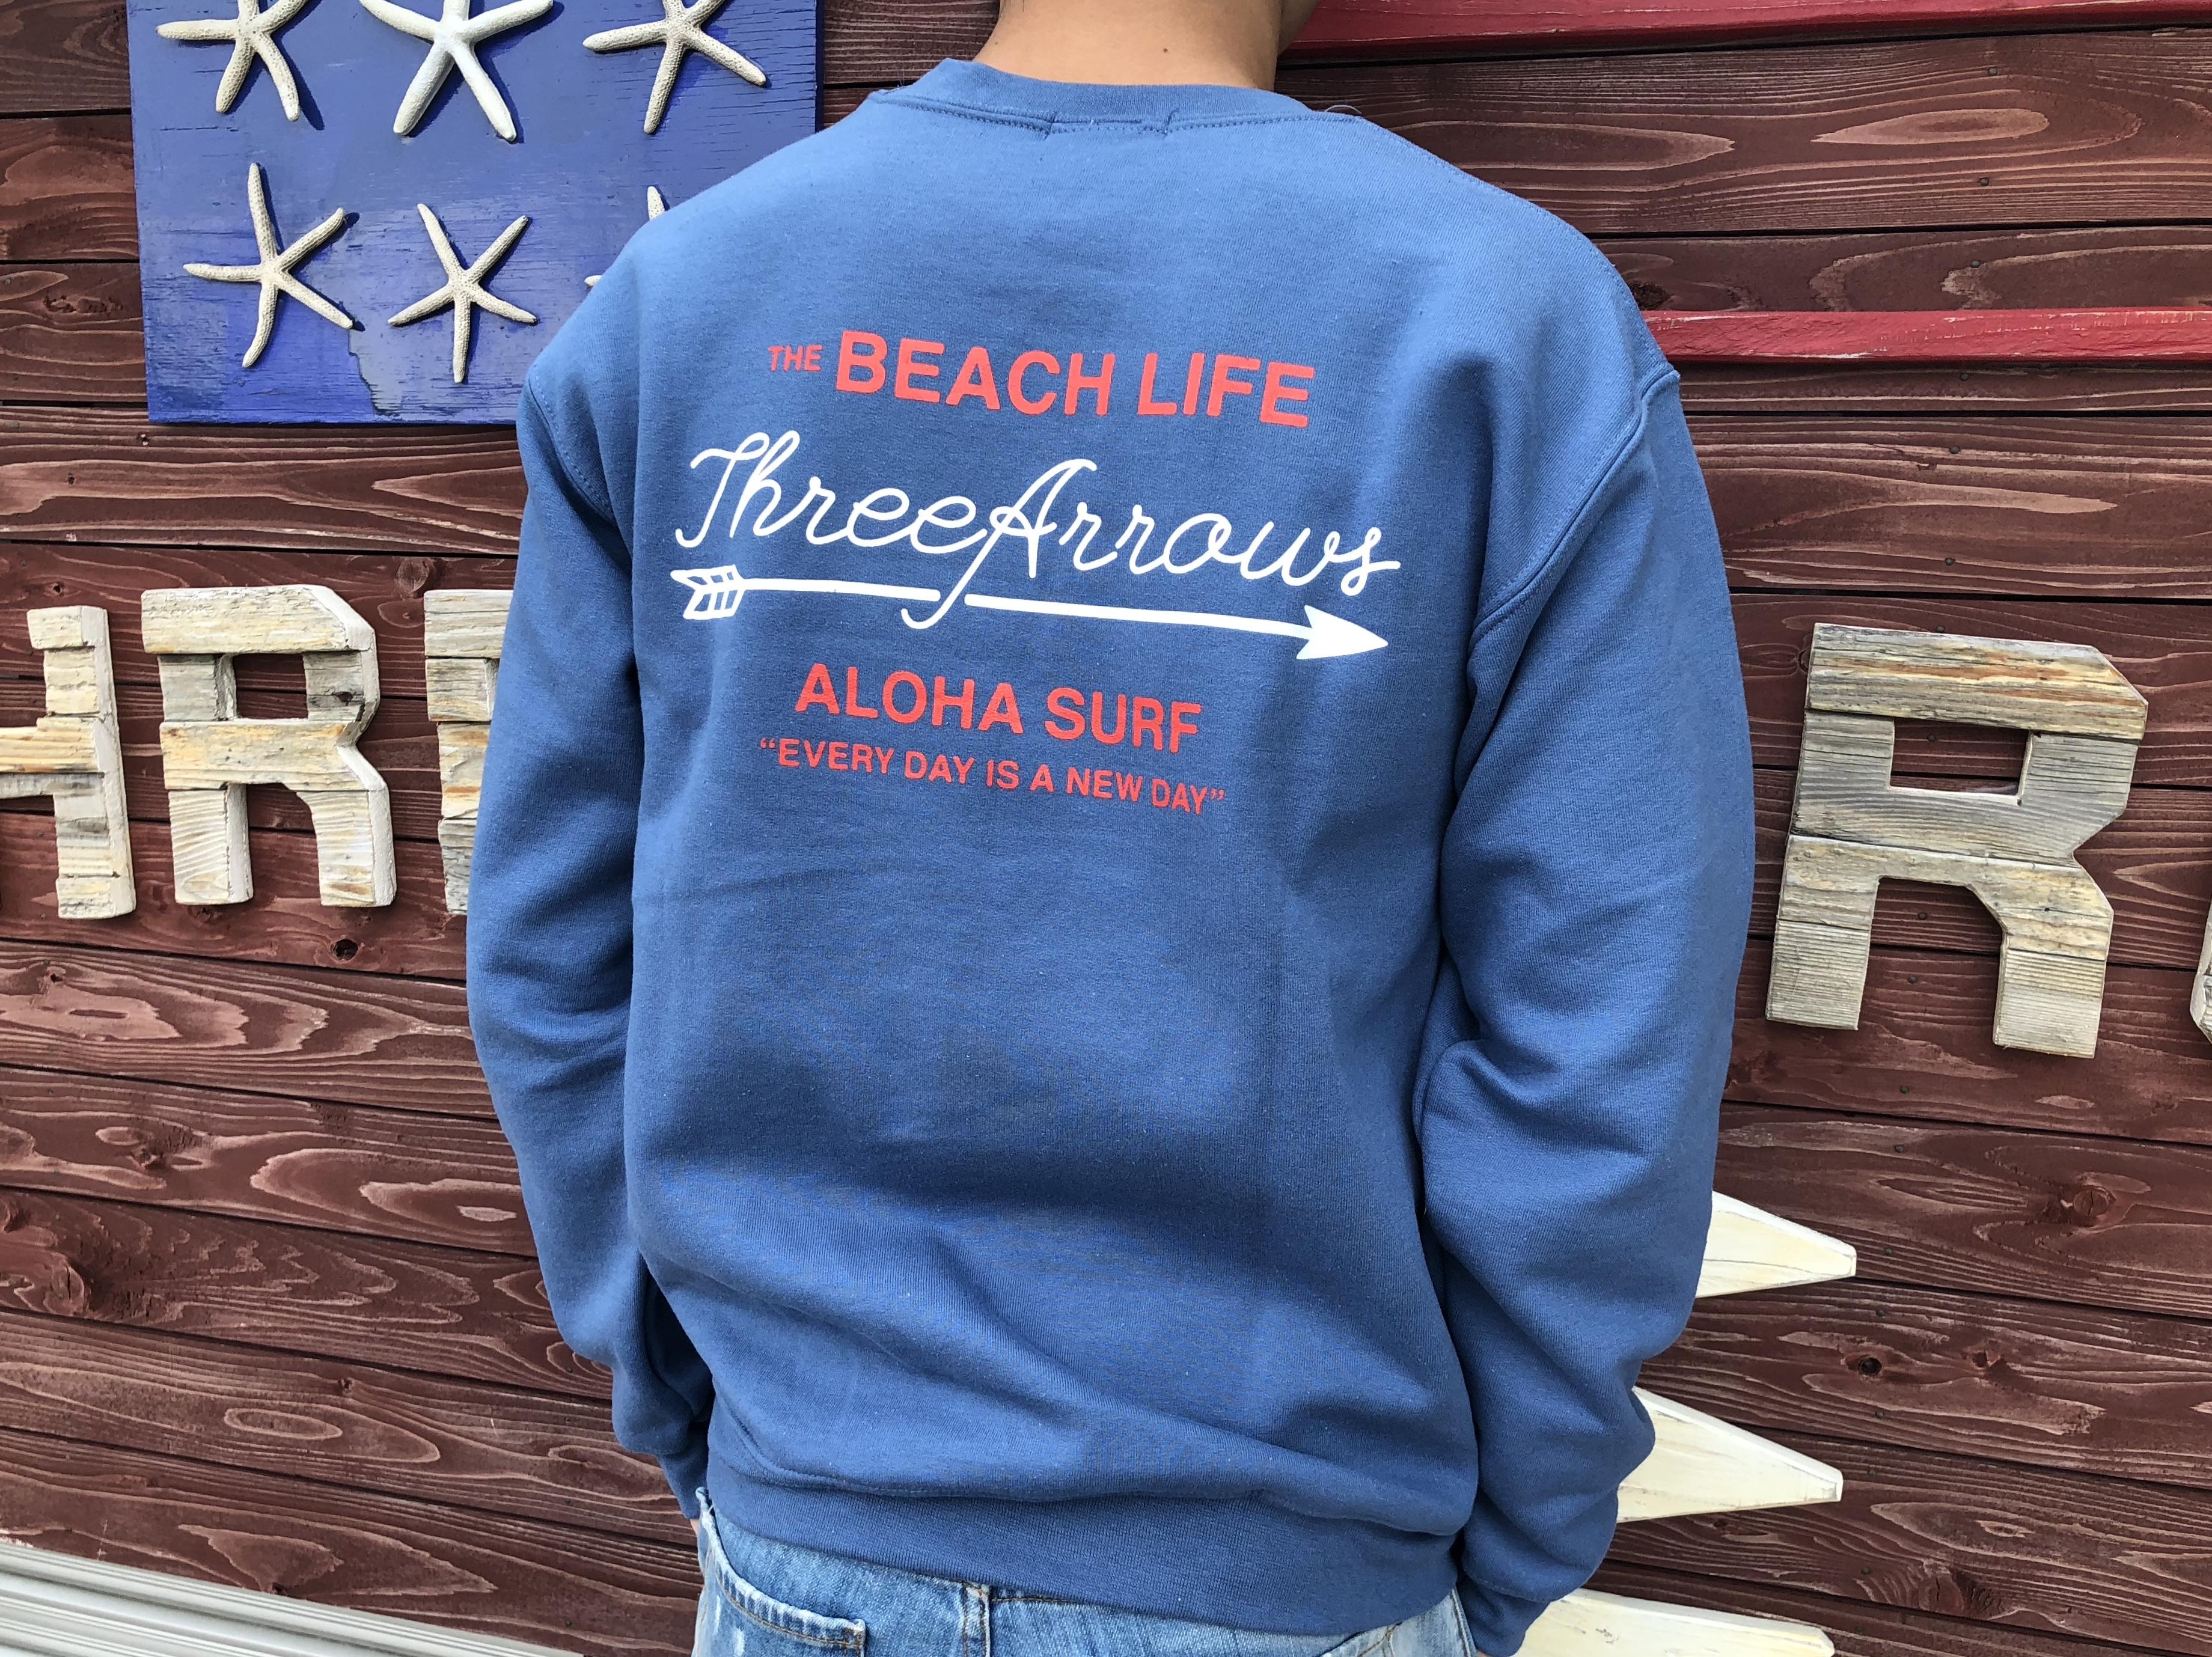 THE BEACH LIFE スウェット(indigo blue)